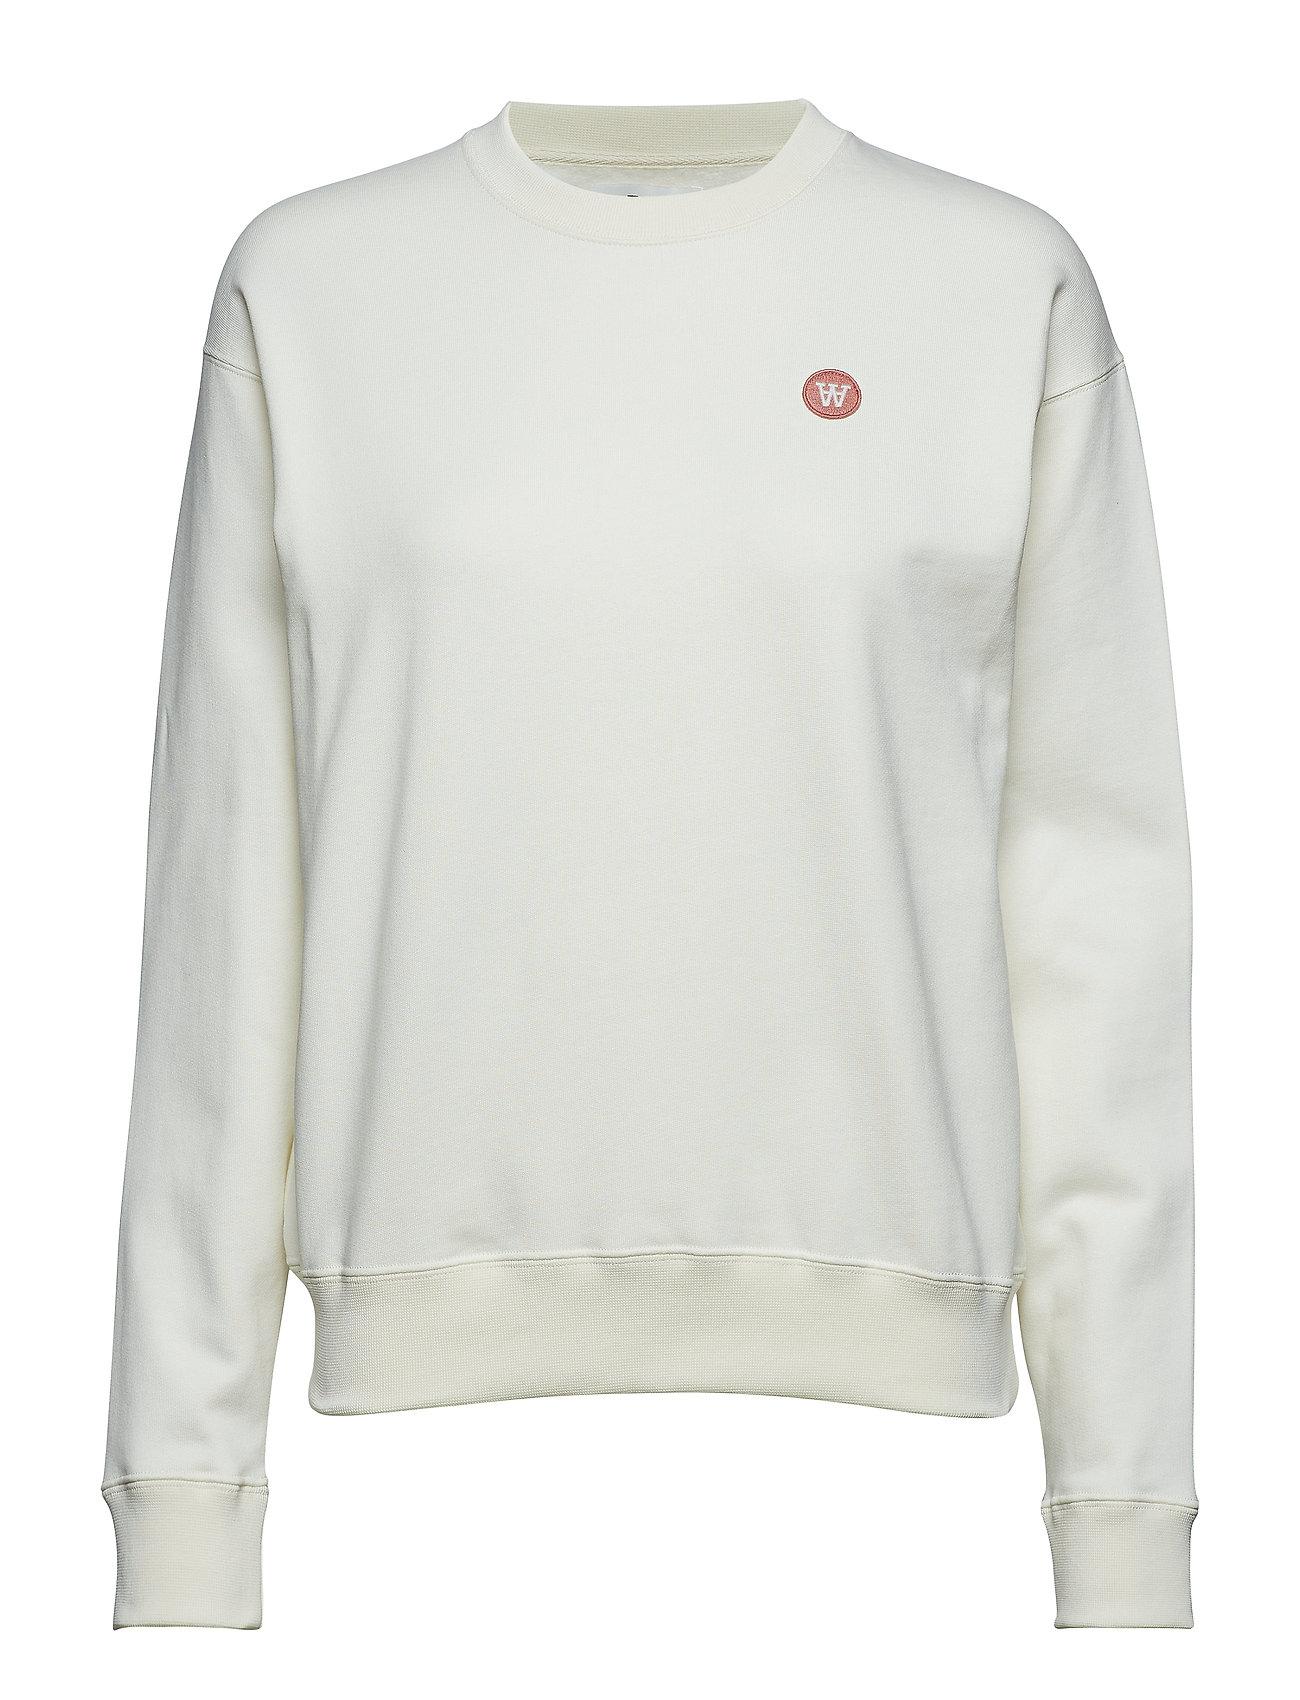 Sweatshirts Sweatshirt Jess off Kr Wood White 1200 BYY0qd